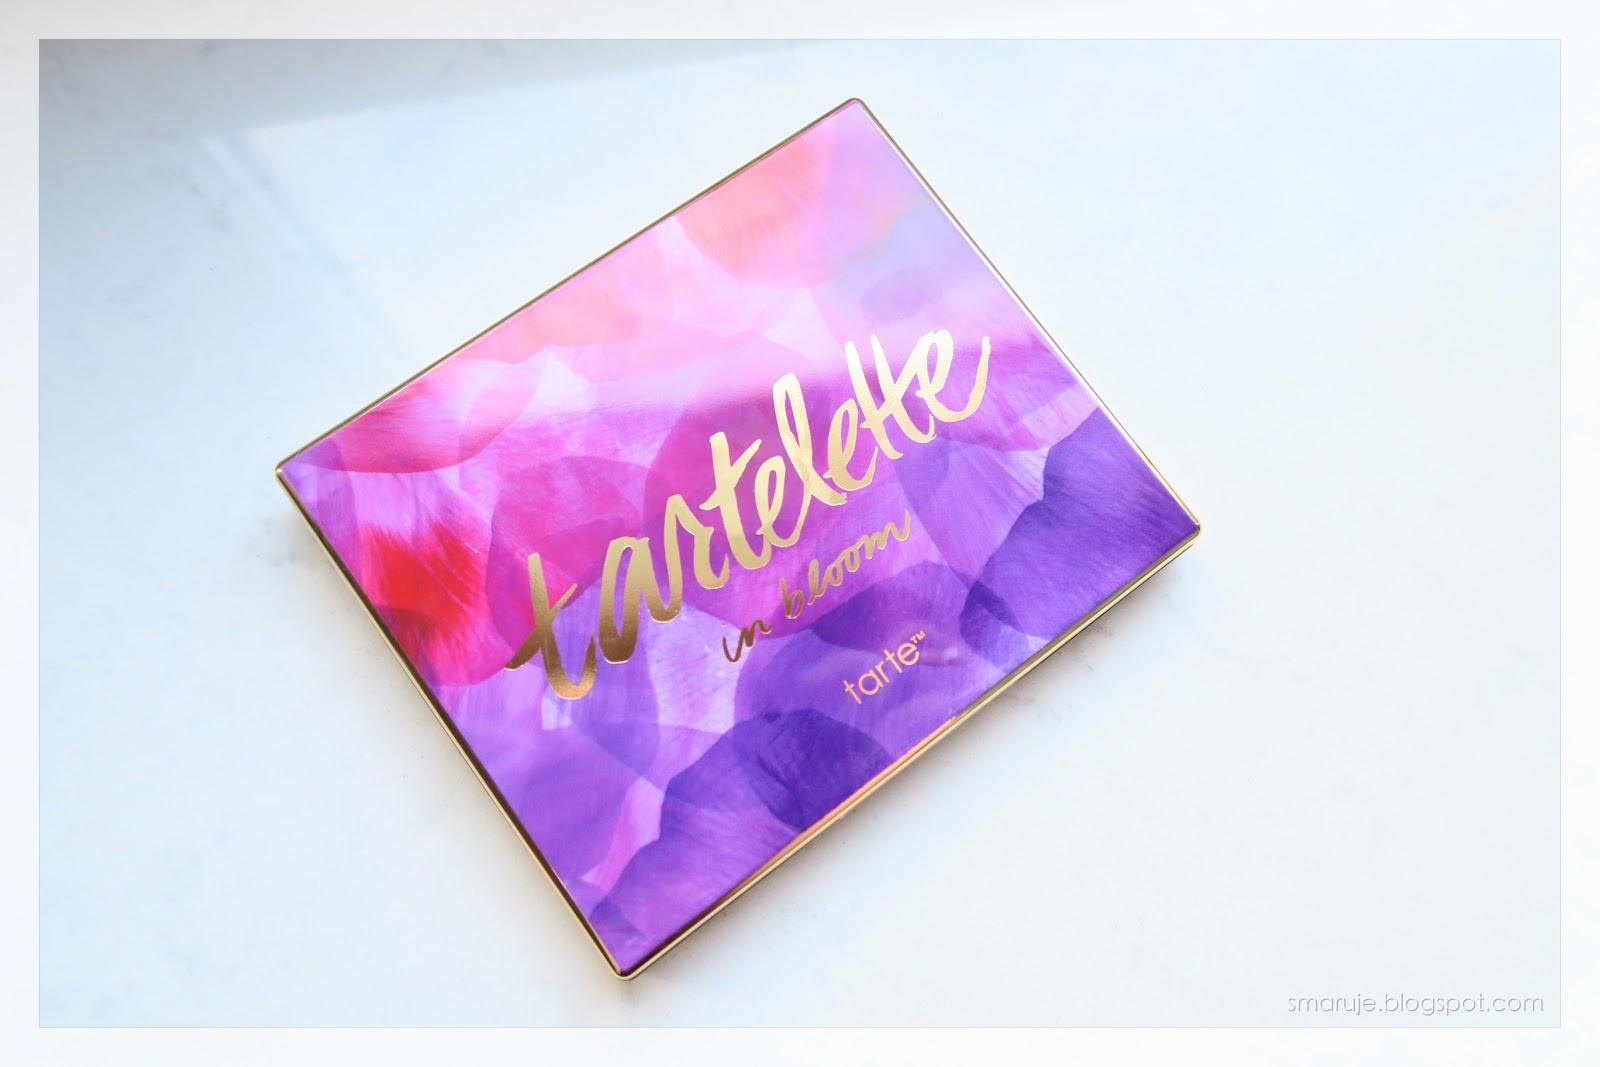 Tarte Tartelette In Bloom paleta cieni swatche